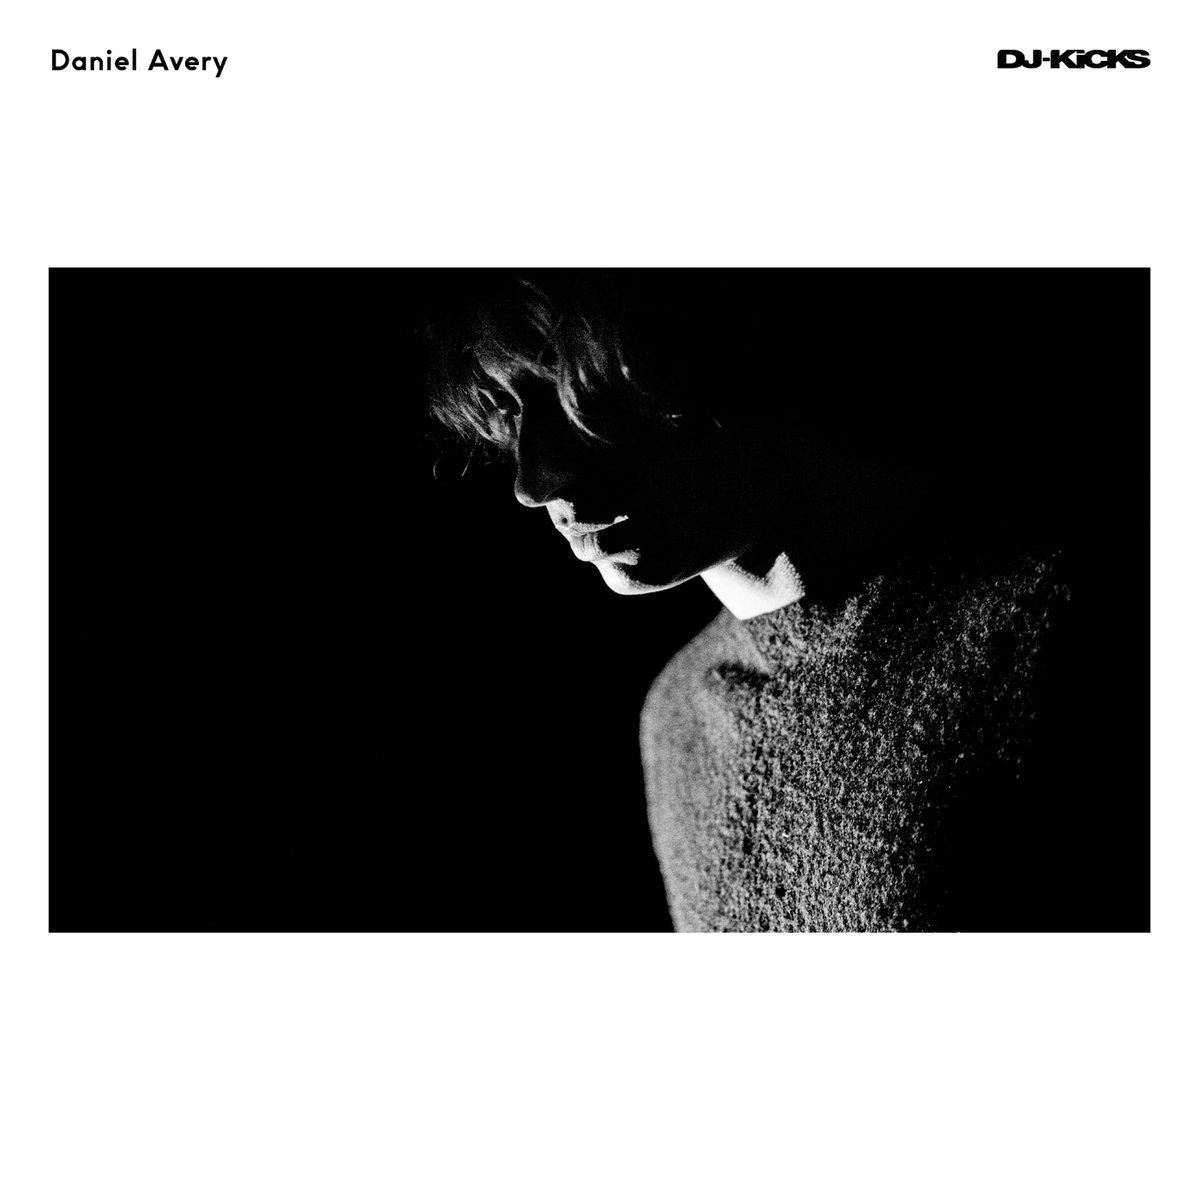 DJ-Kicks (Daniel Avery)   Daniel Avery